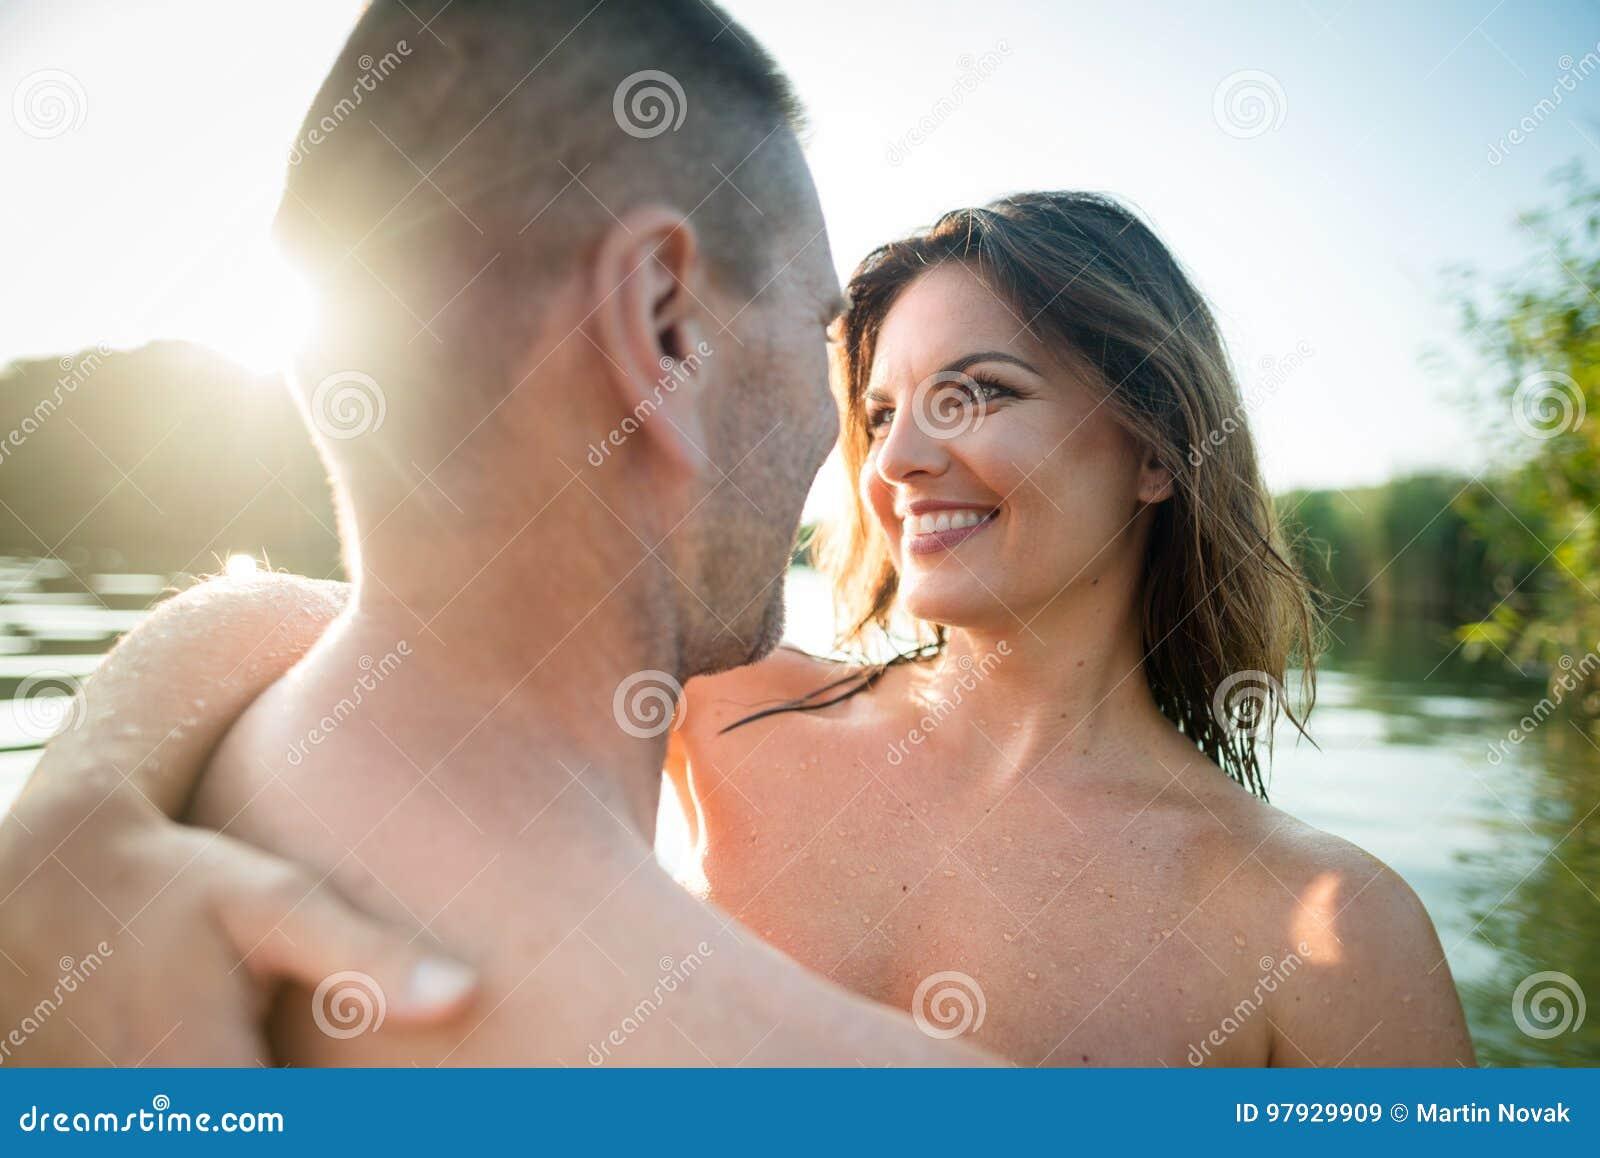 Laurence boccolini fake nude